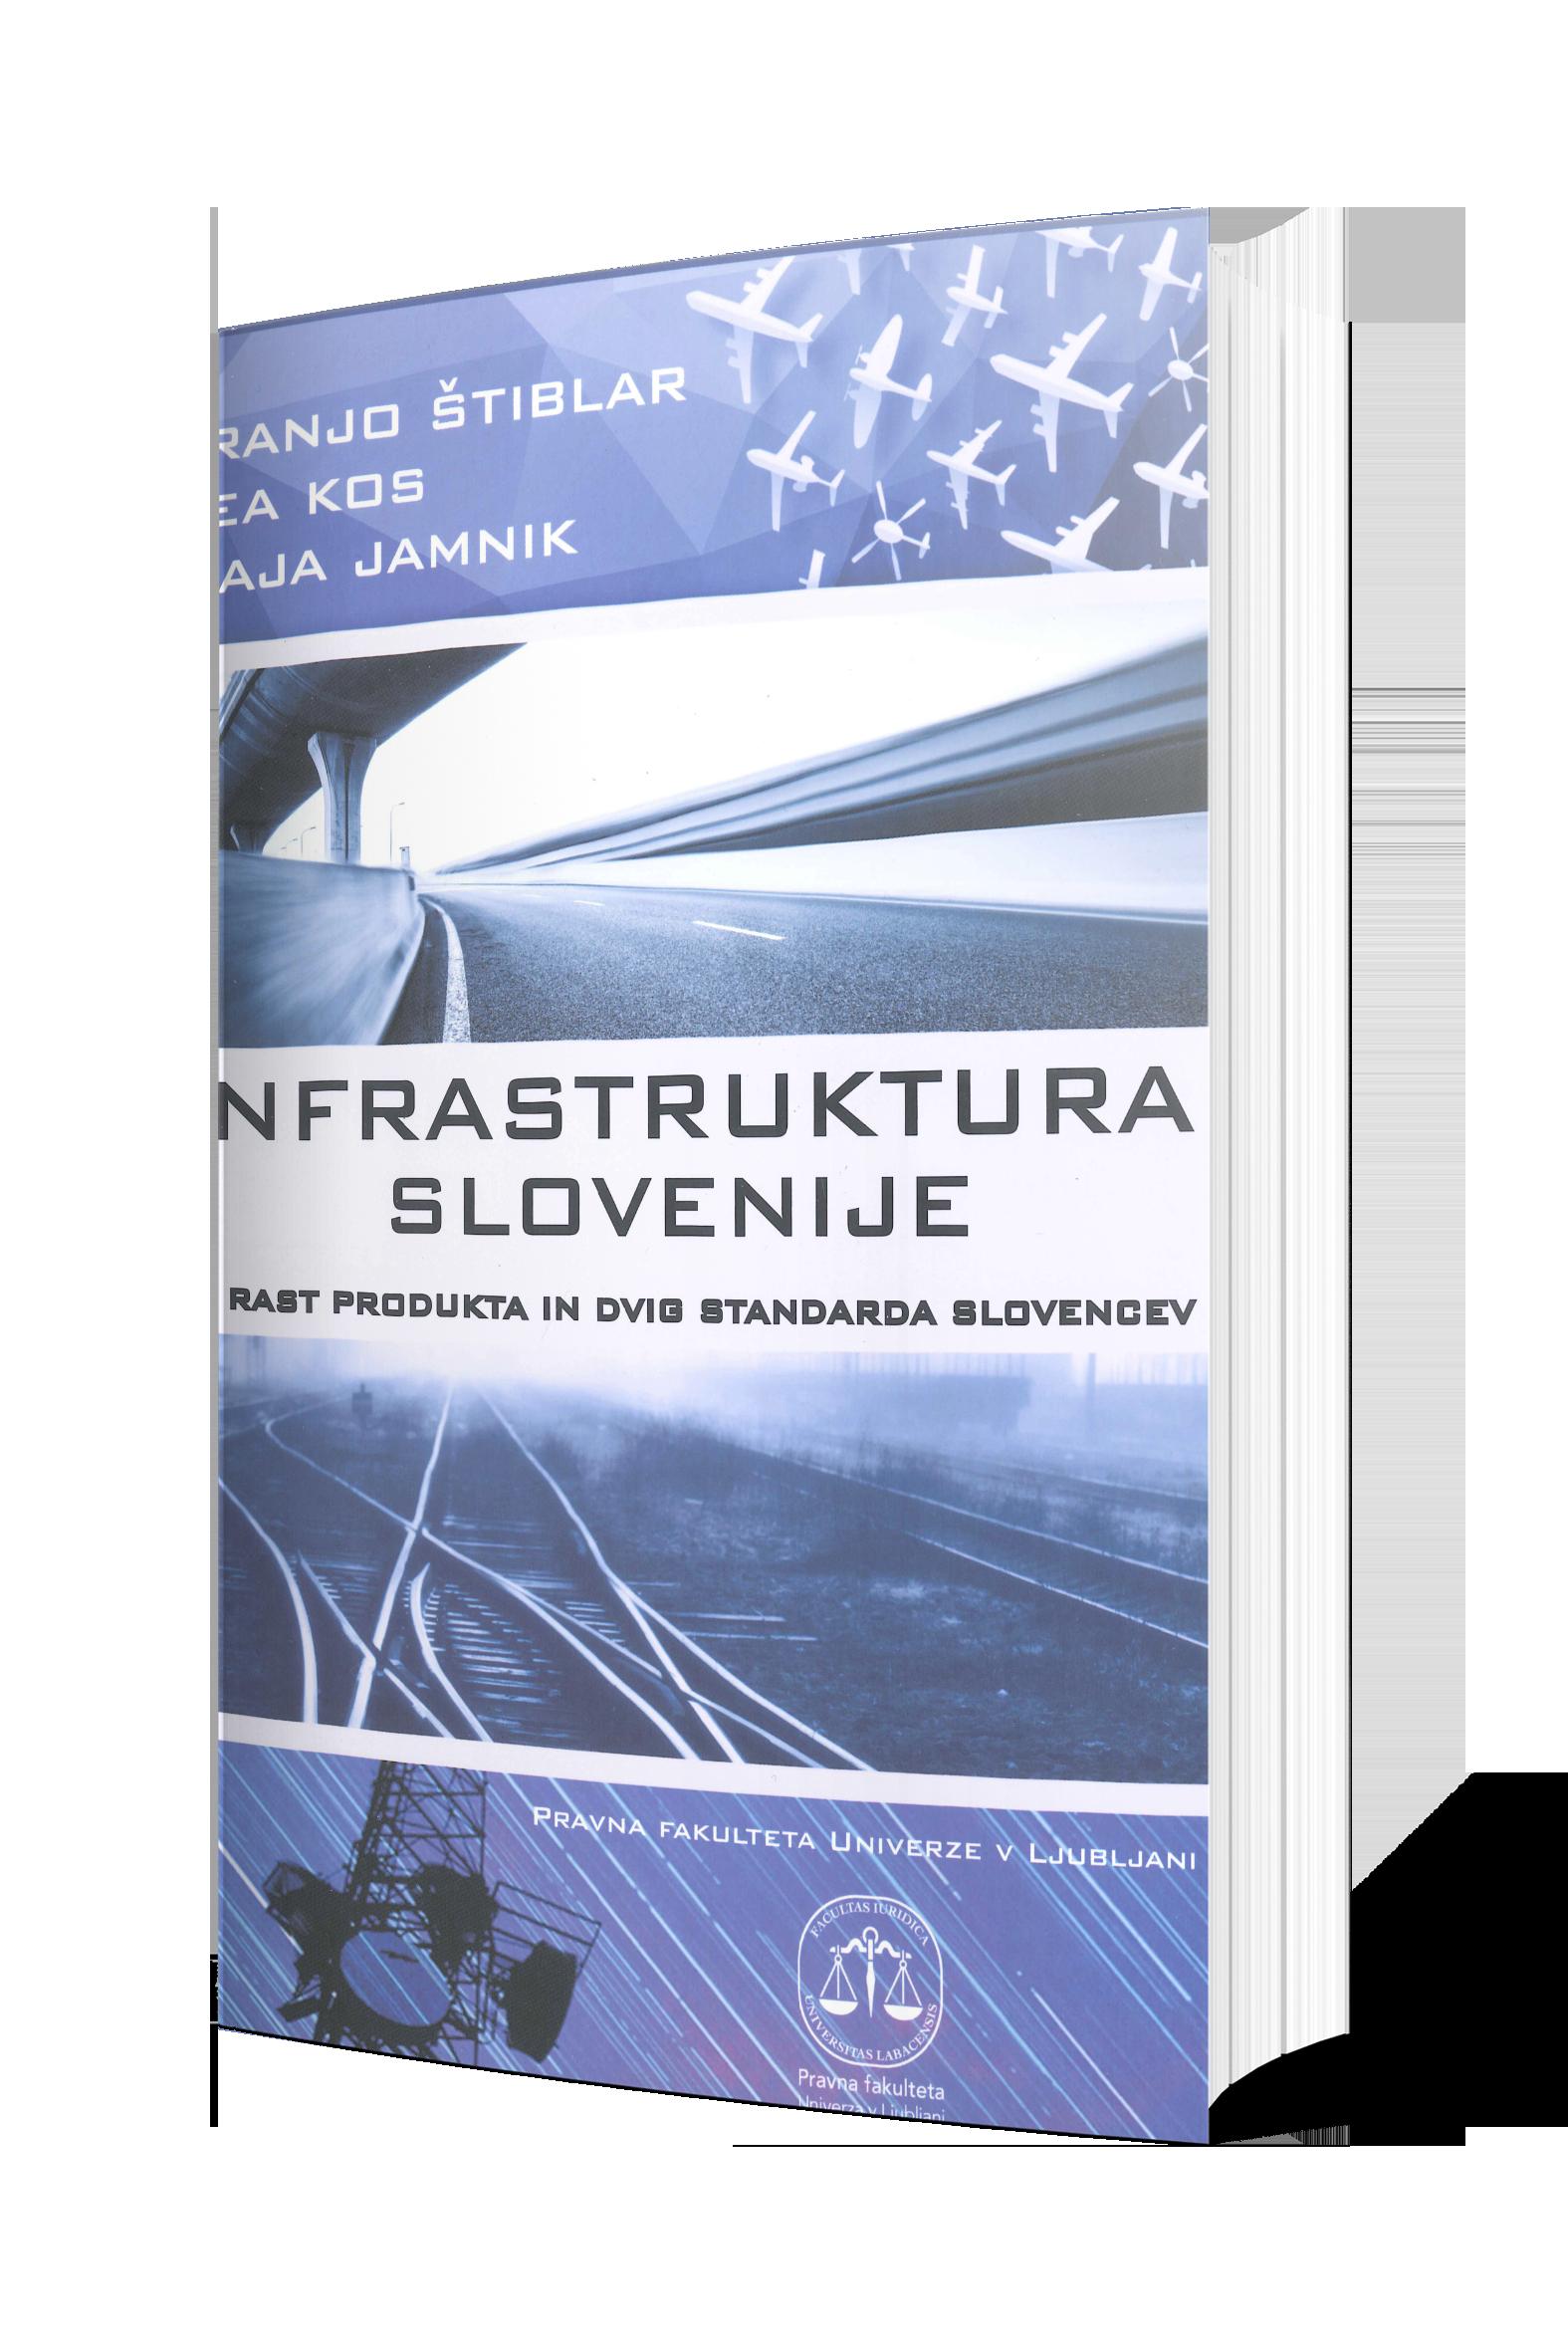 infrastrukturaslovenije